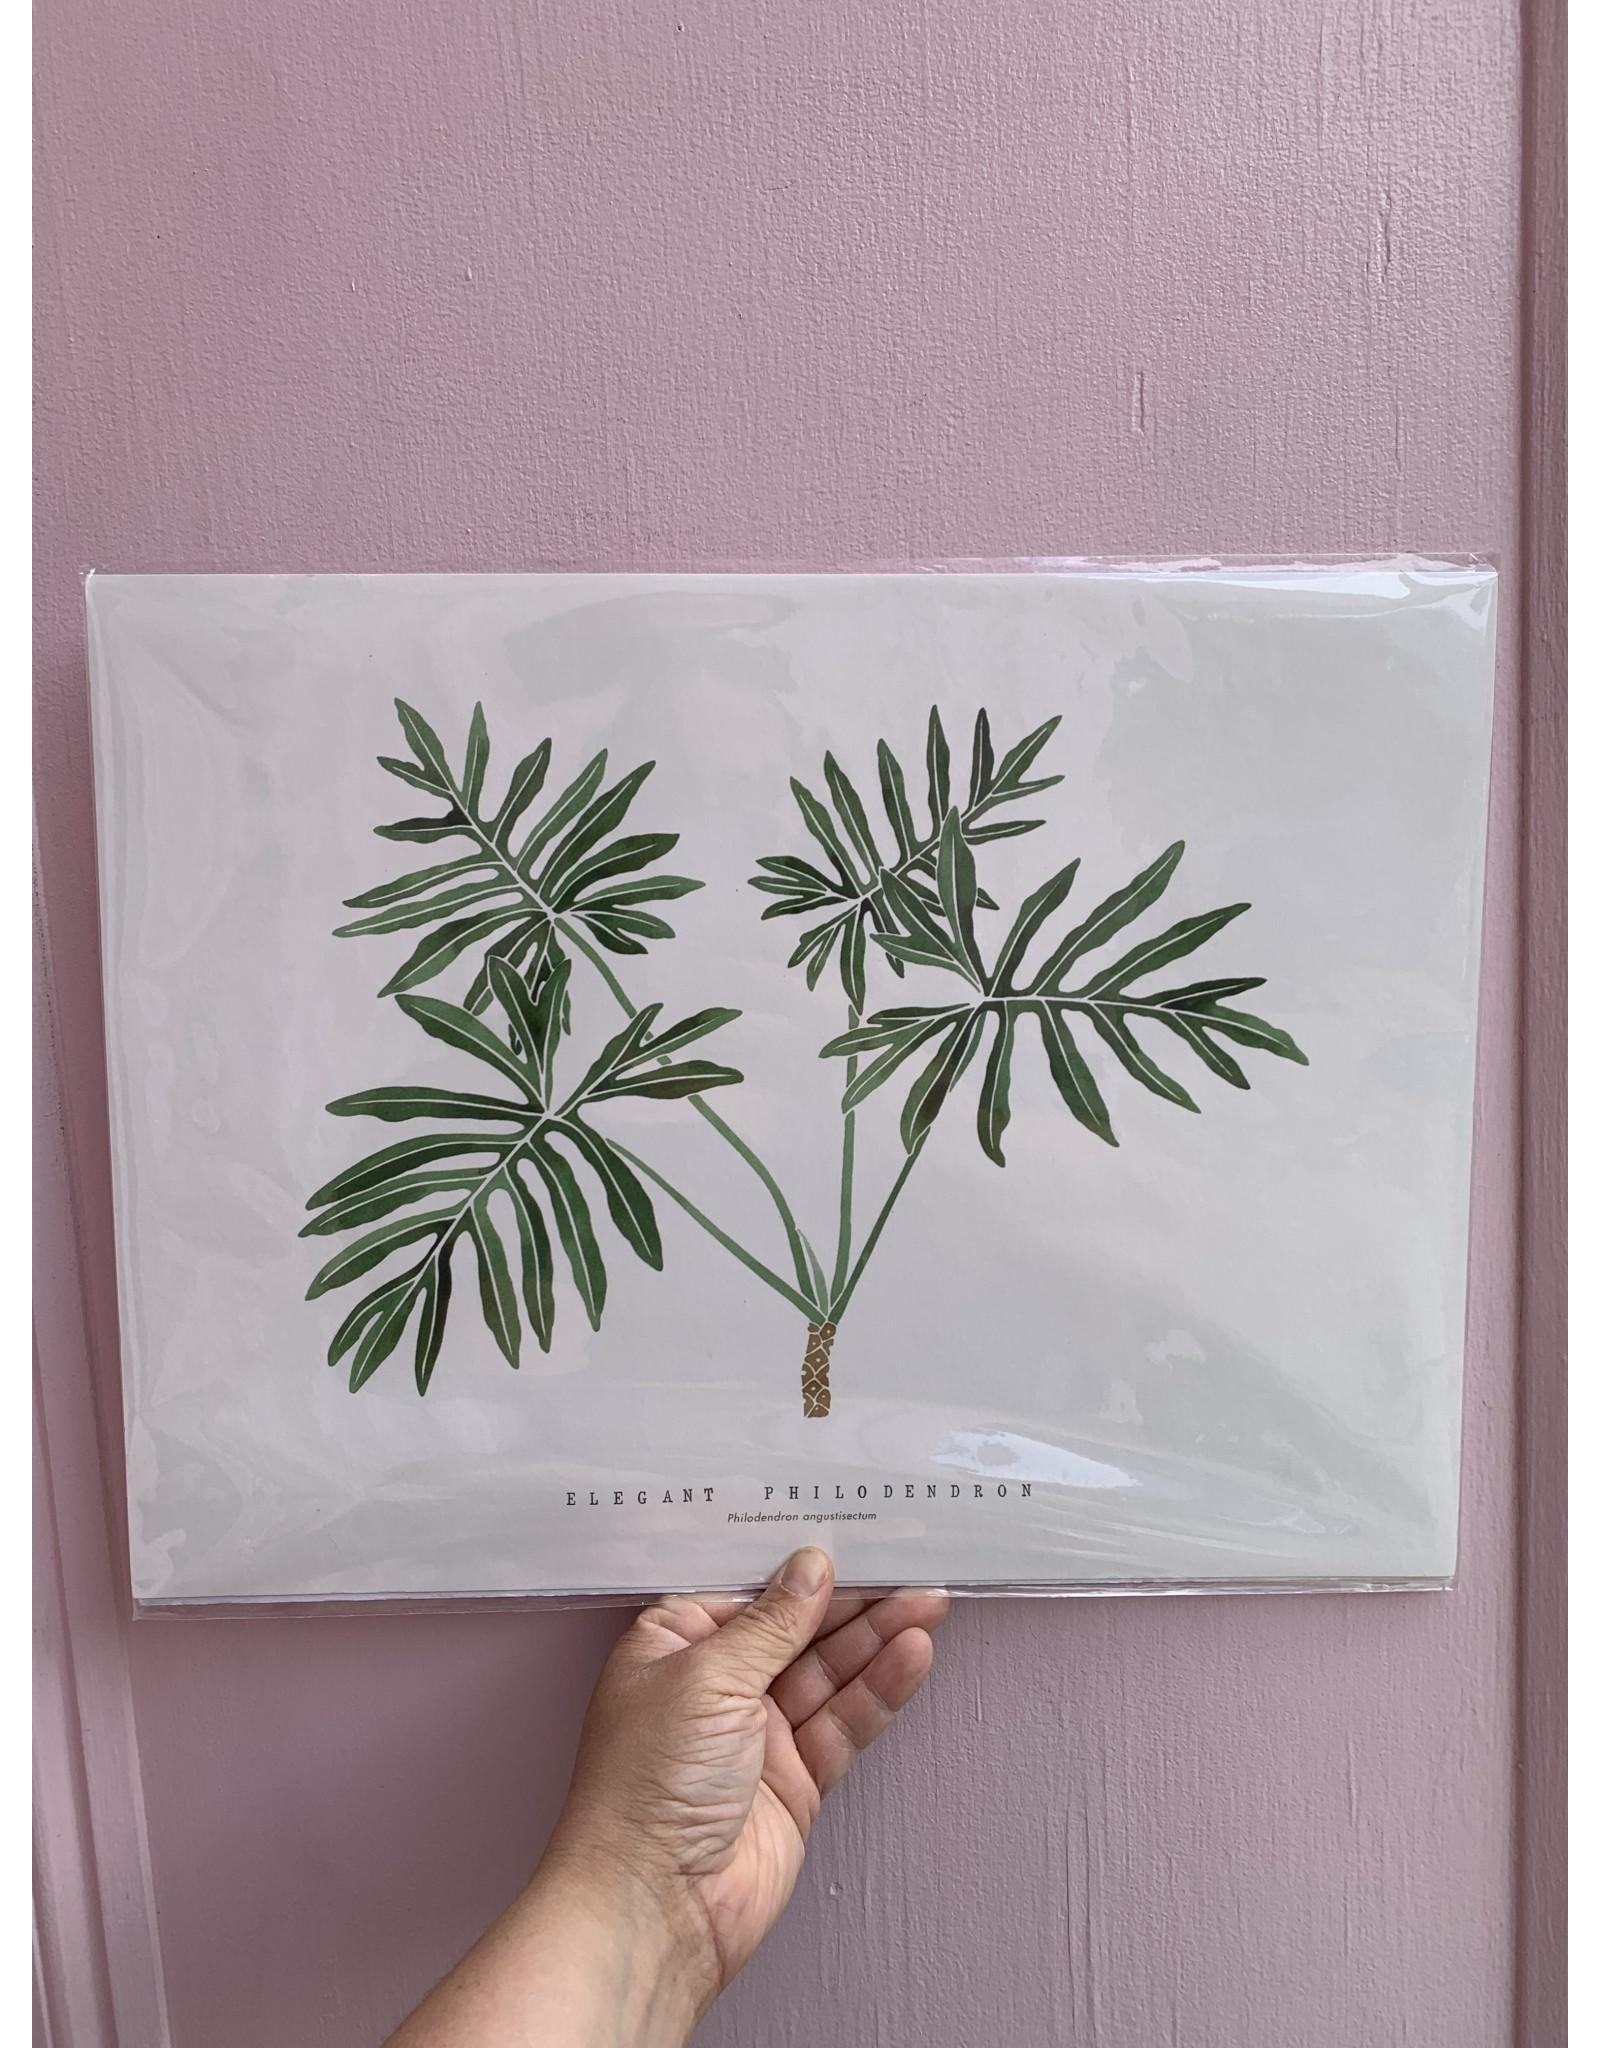 Elegant Philodendron 12x16